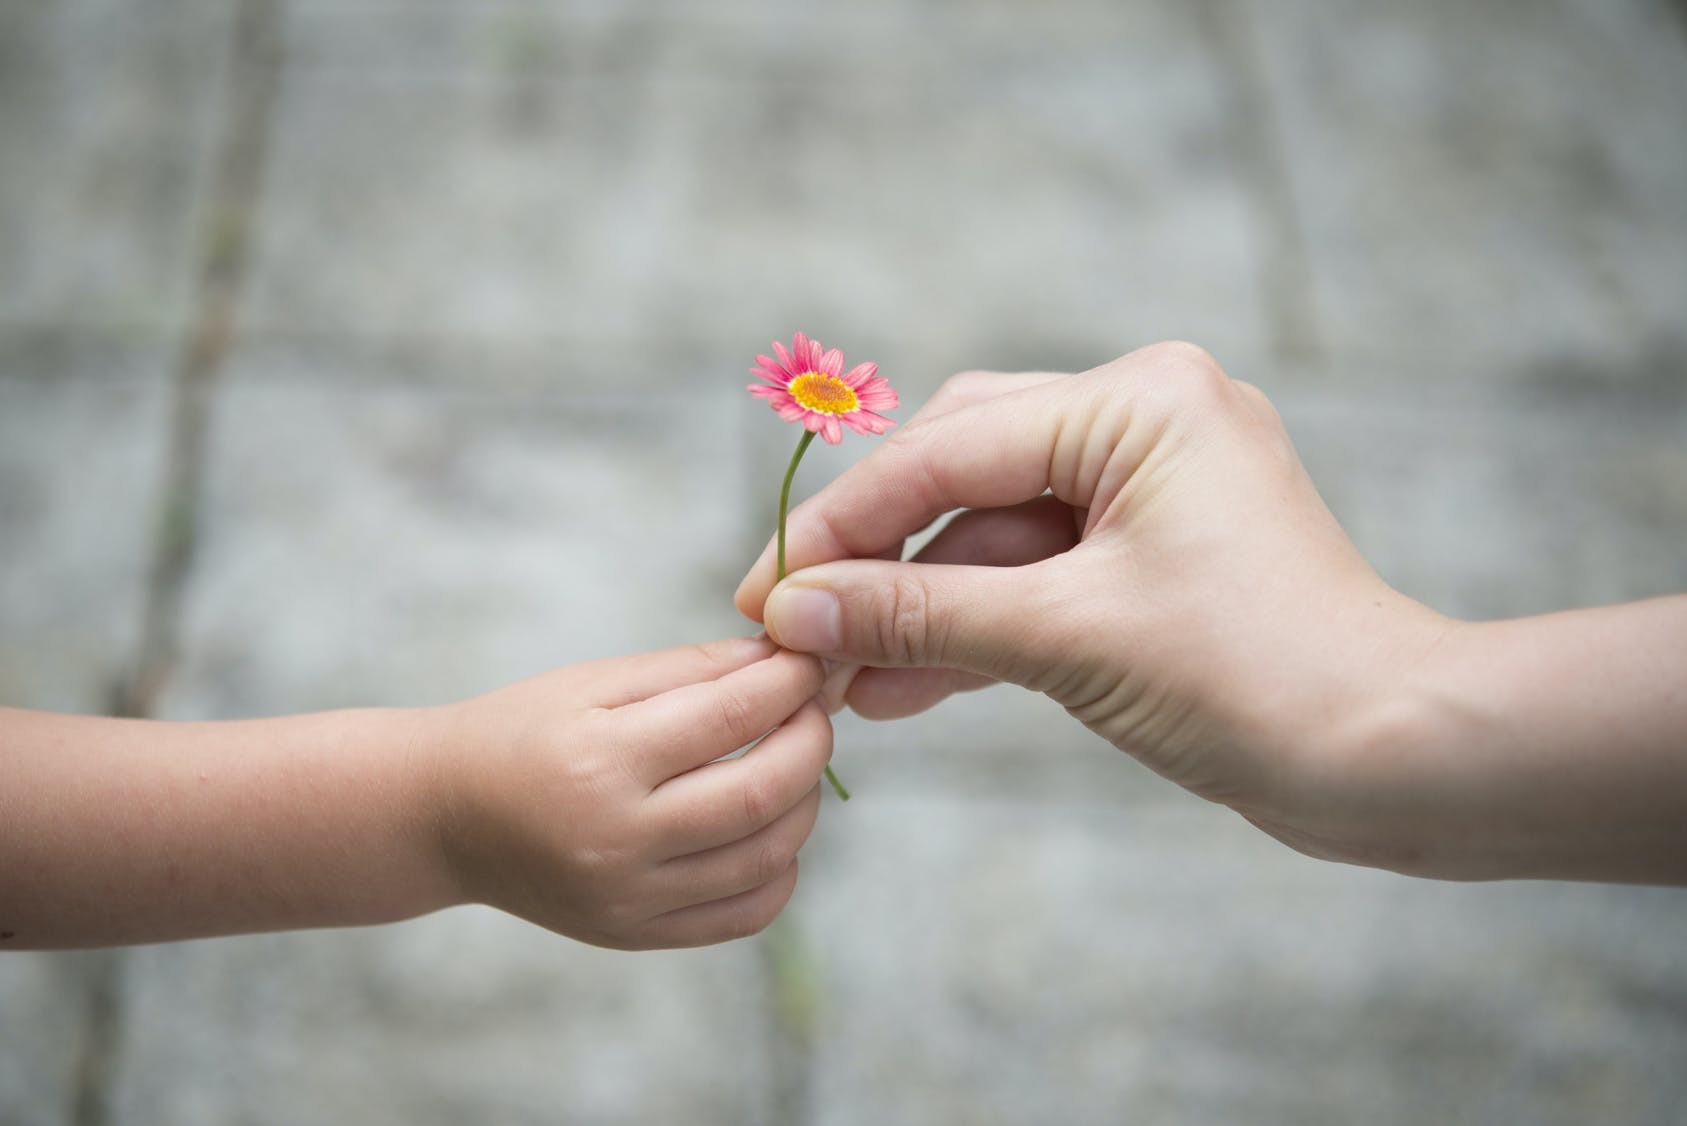 Politesse : montrer l'exemple à son enfant